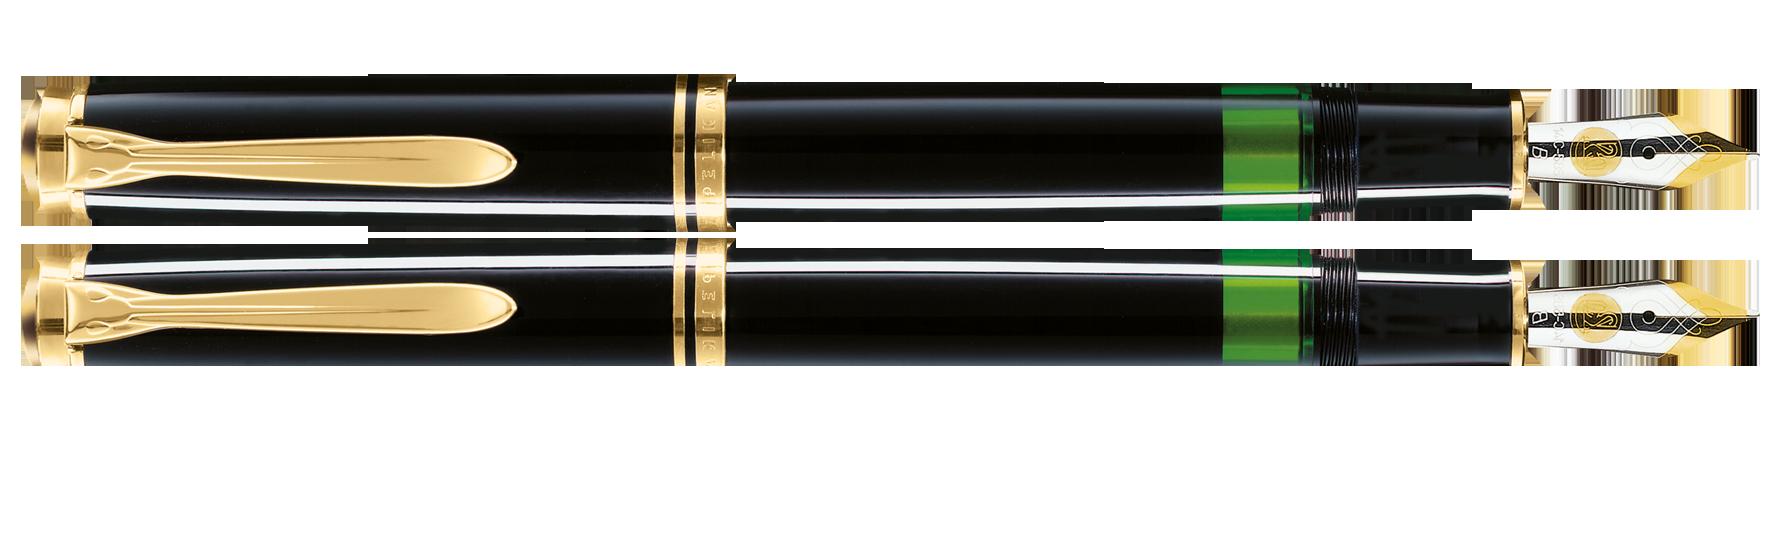 Pelikan Souverän M400 Black Fountain Pen